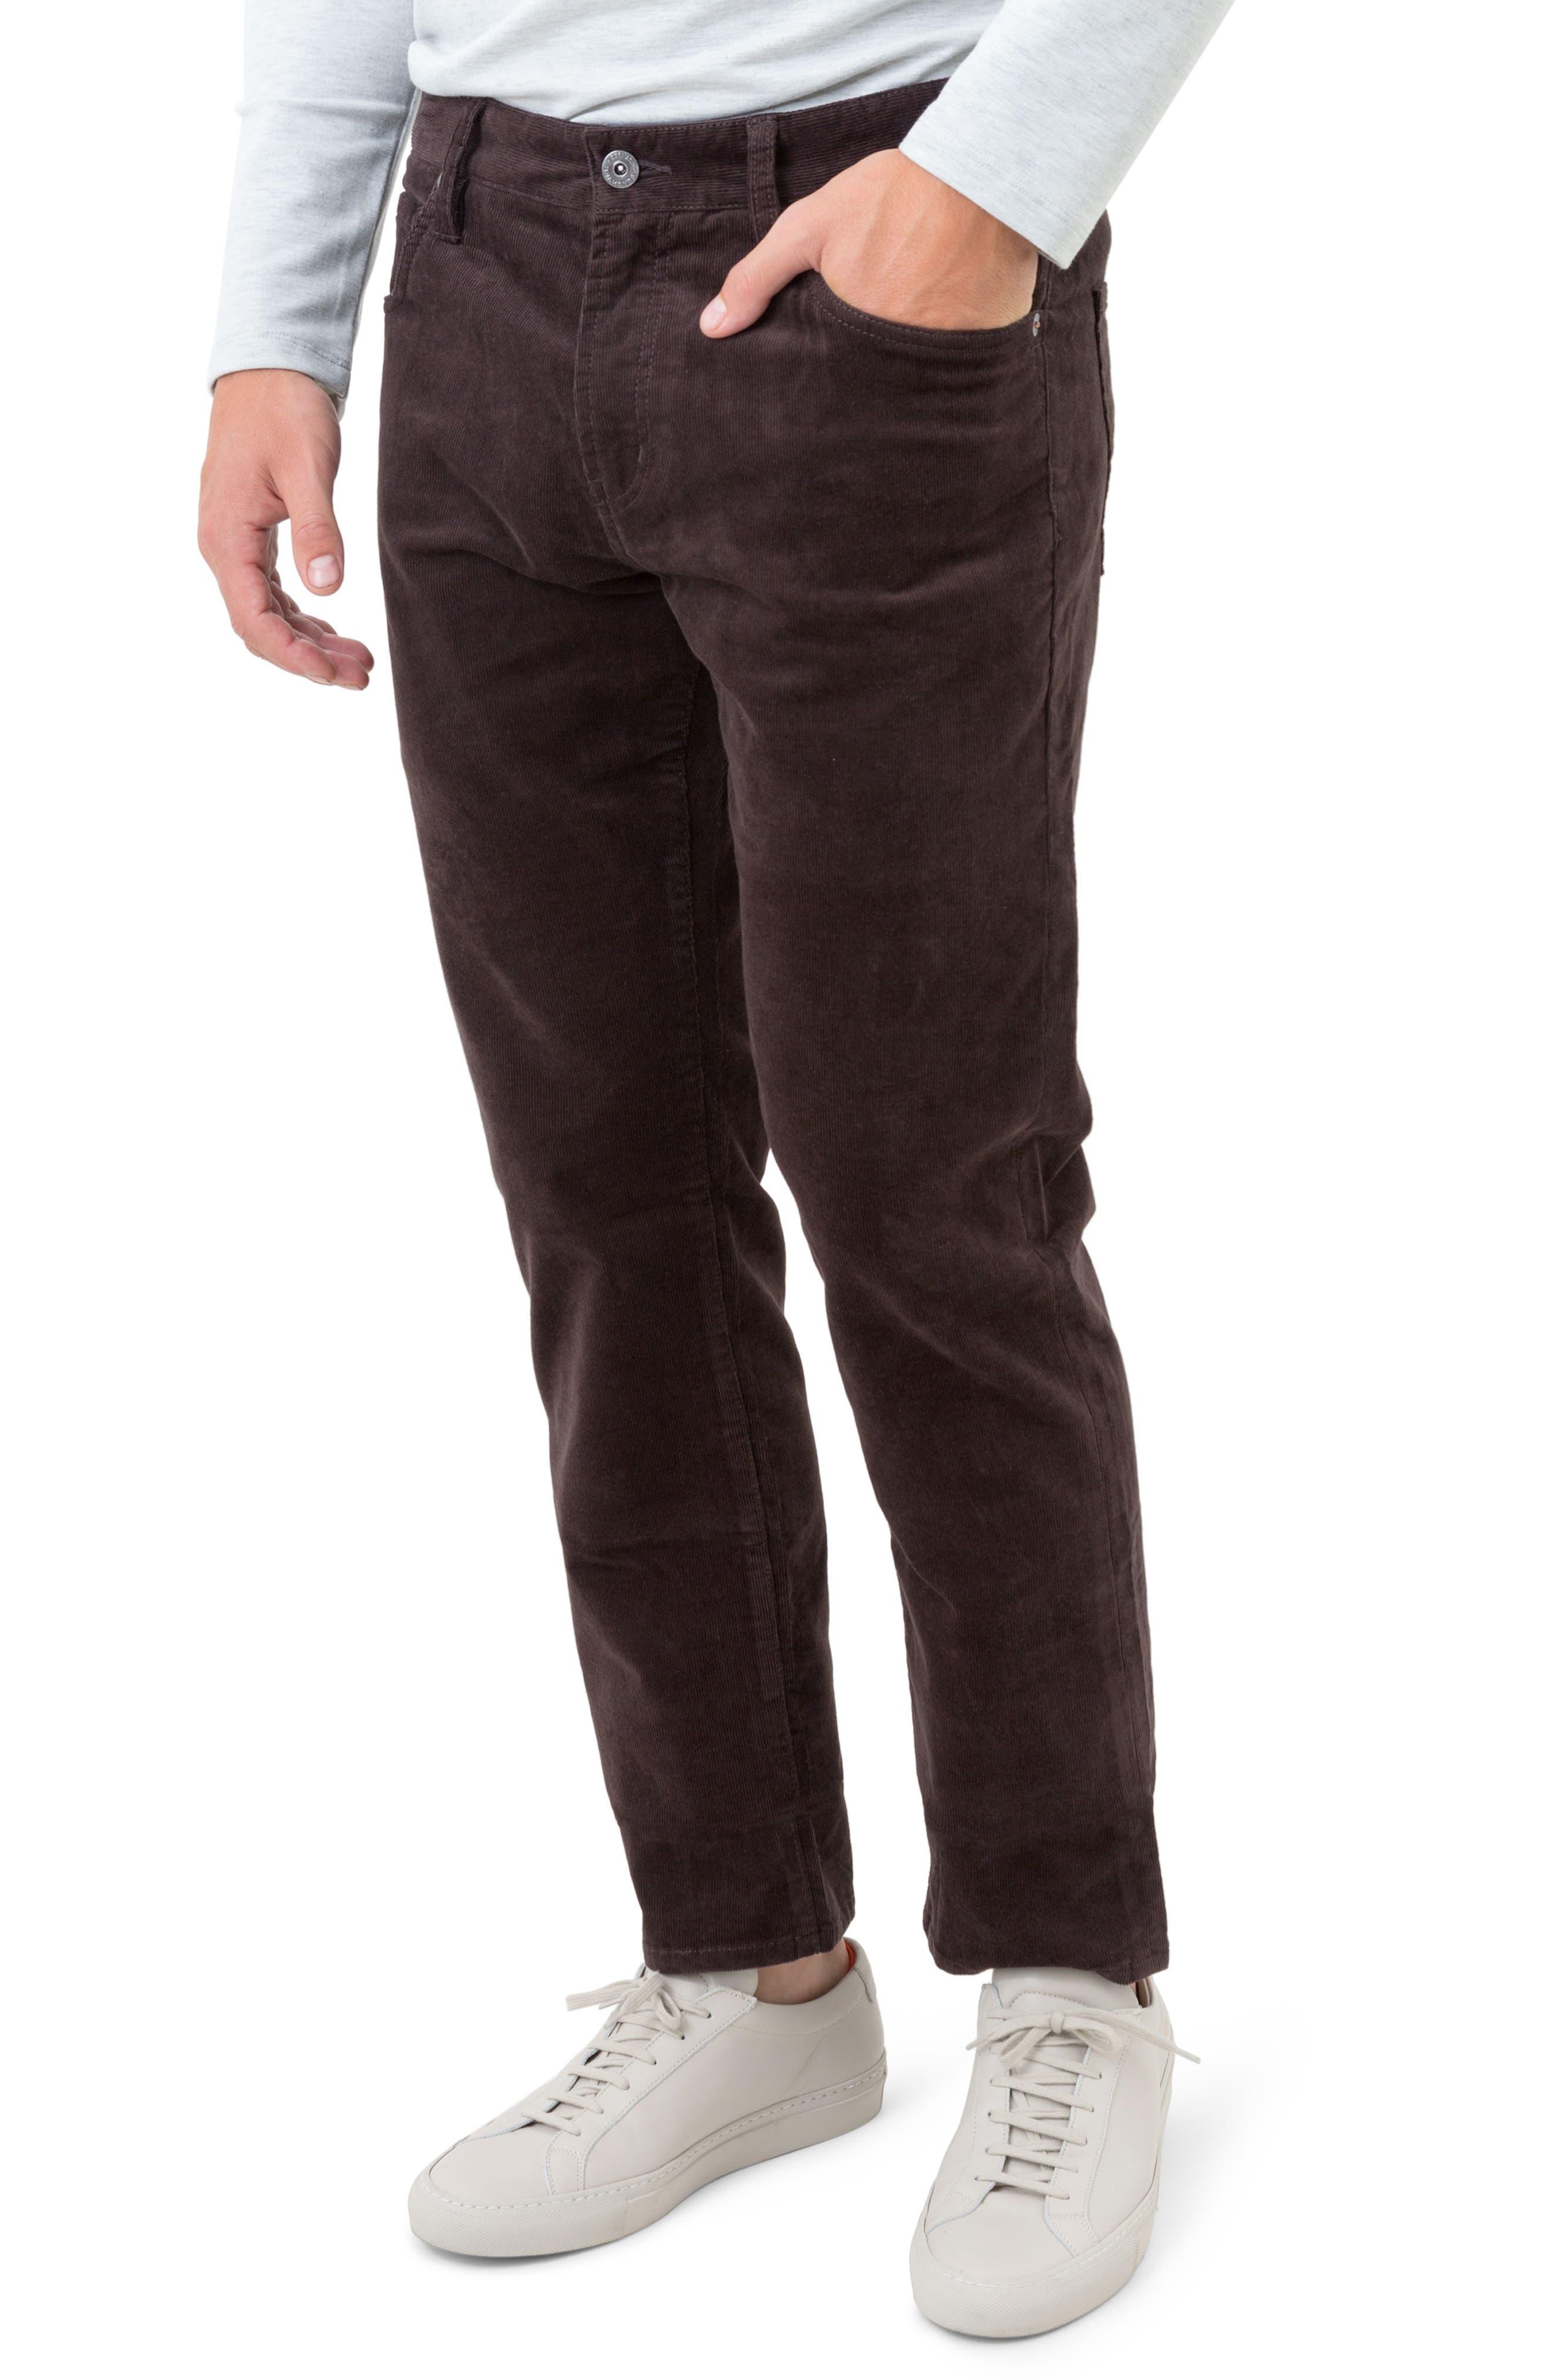 Courtland Slim Fit Corduroy Pants,                             Main thumbnail 1, color,                             MOCHA BROWN